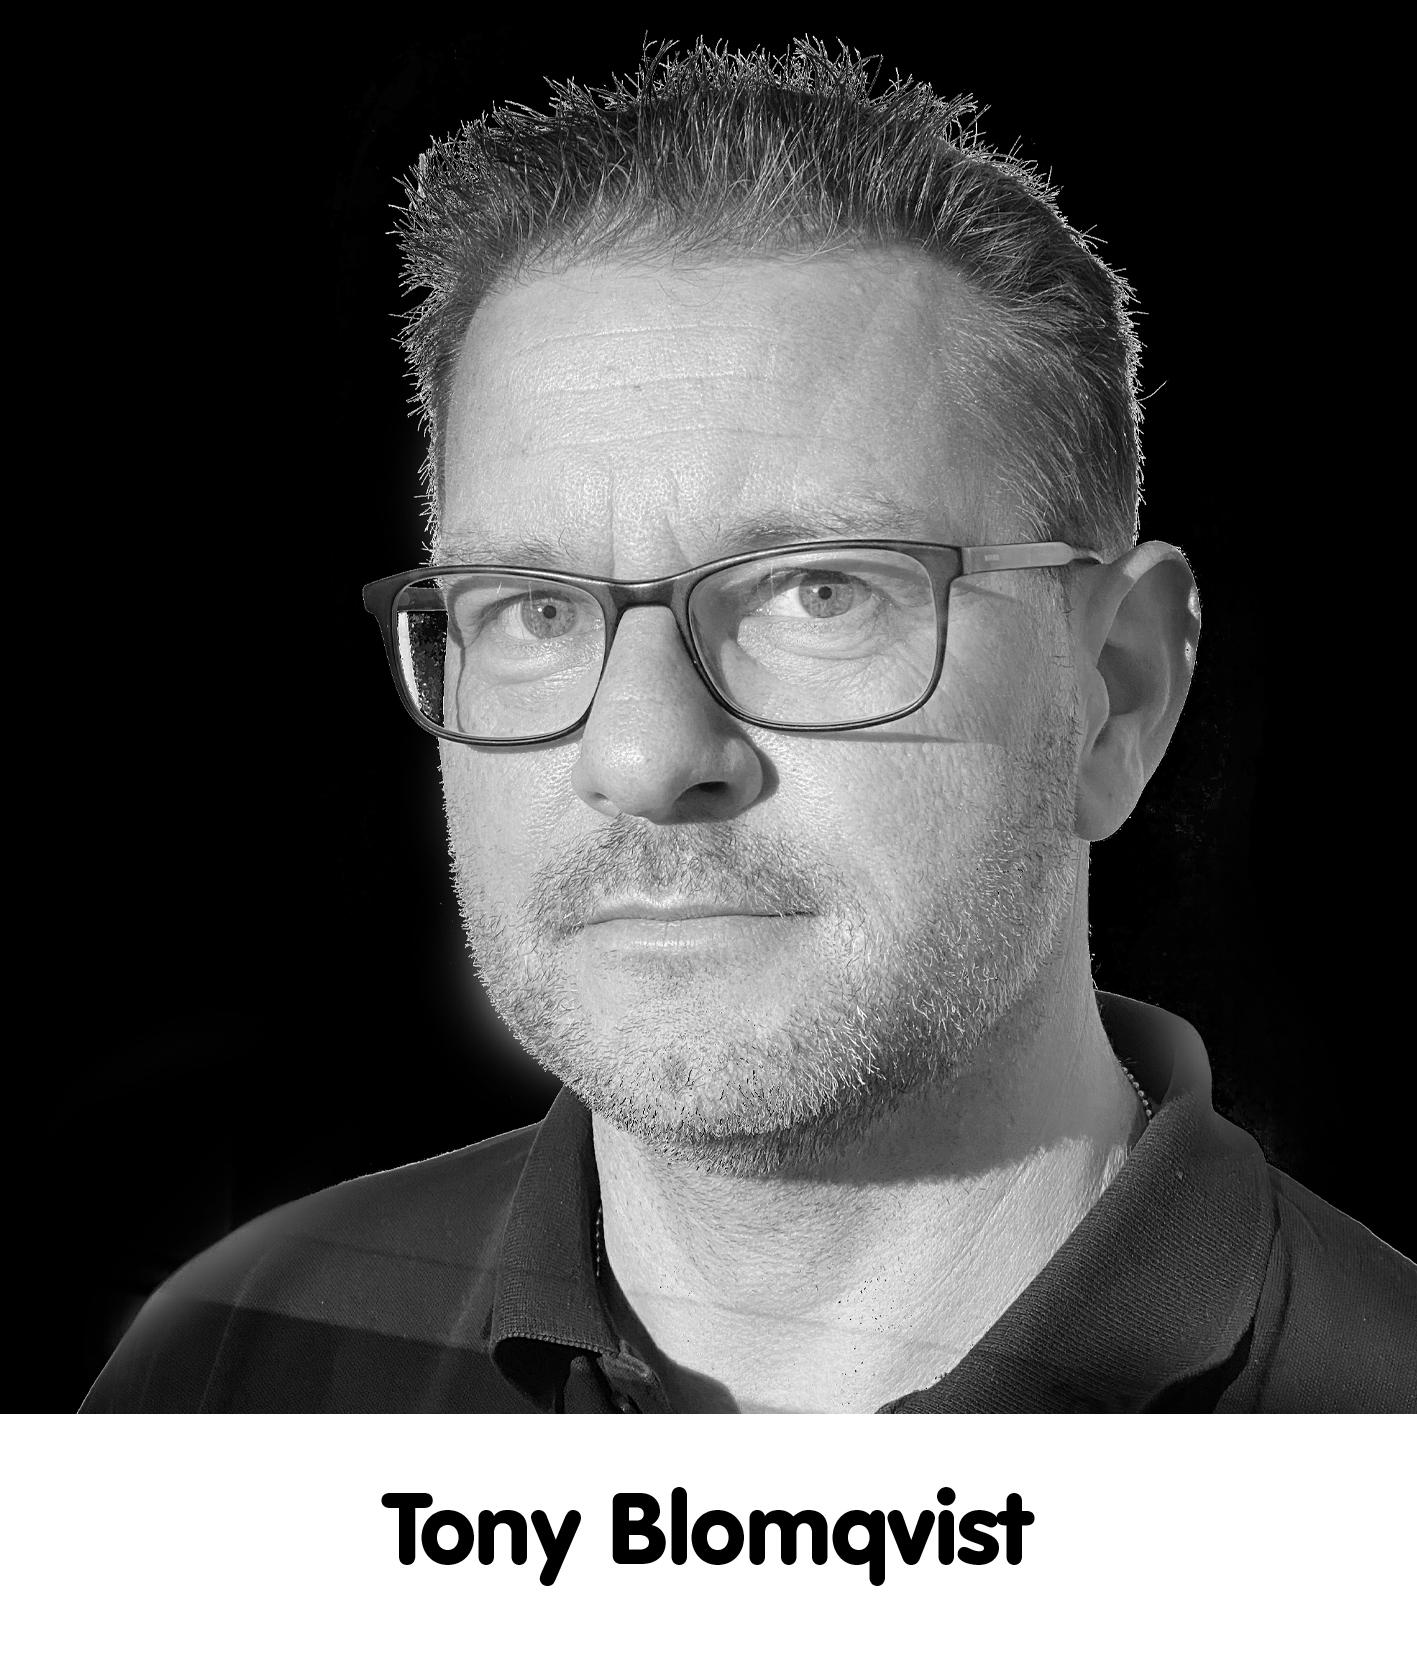 Tony Blomqvist